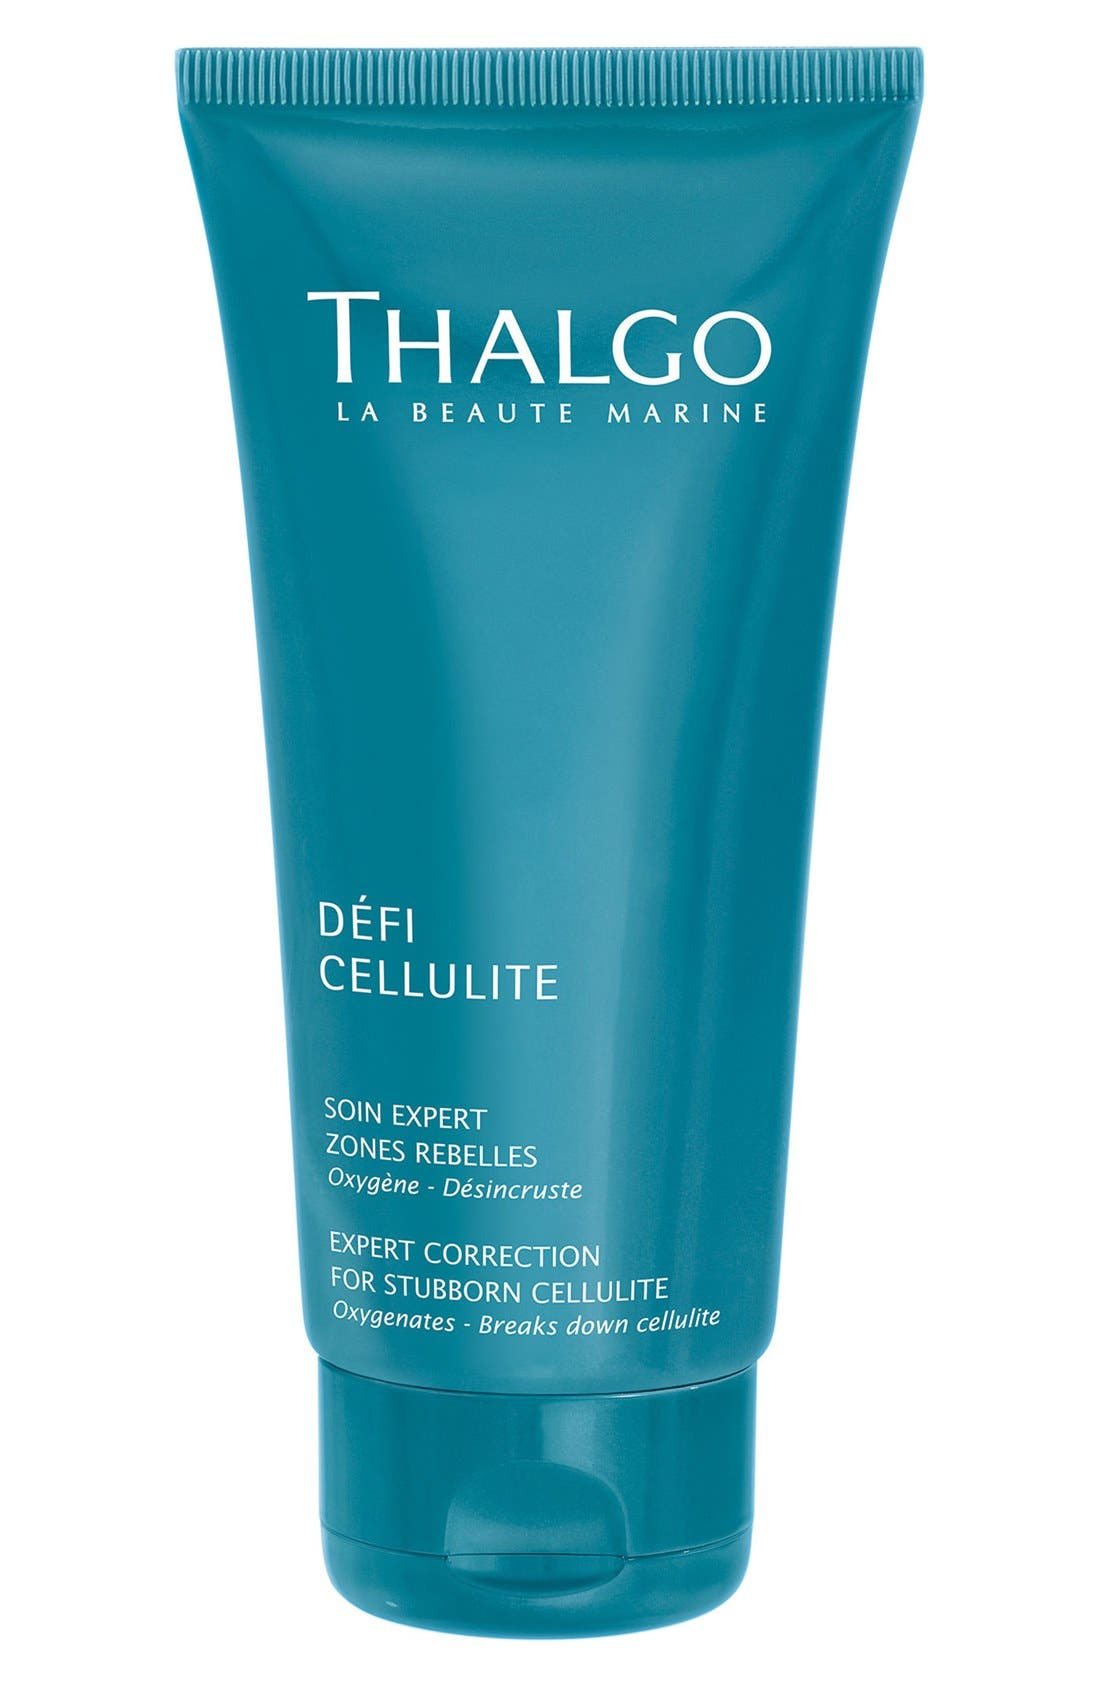 Thalgo Expert Correction for Stubborn Cellulite Treatment